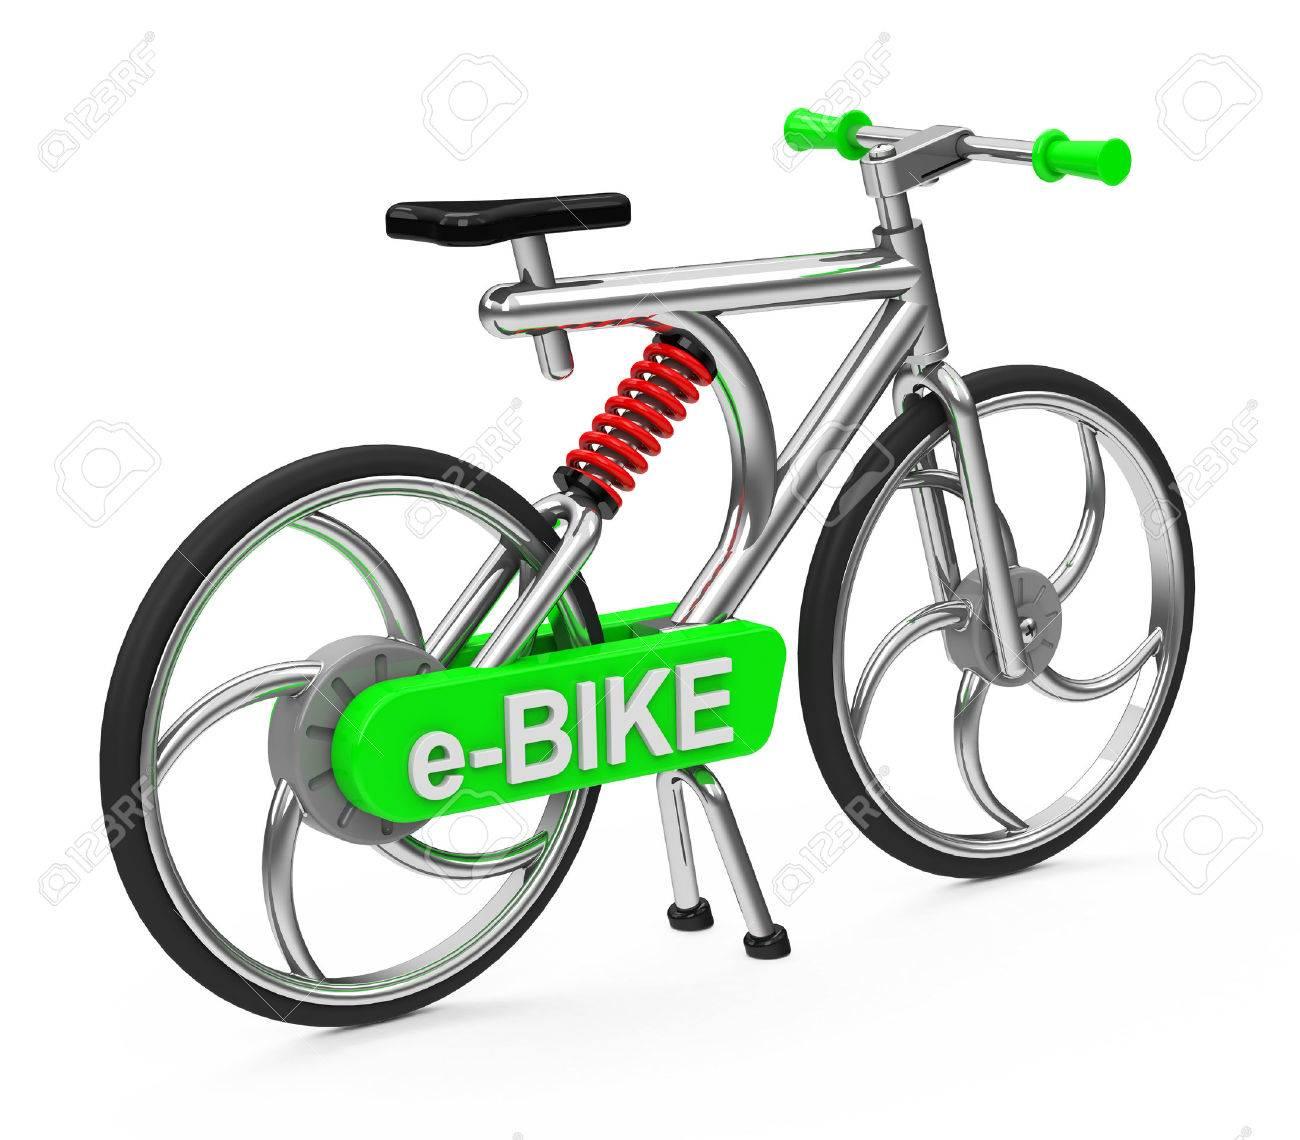 e-Bike - 26325923